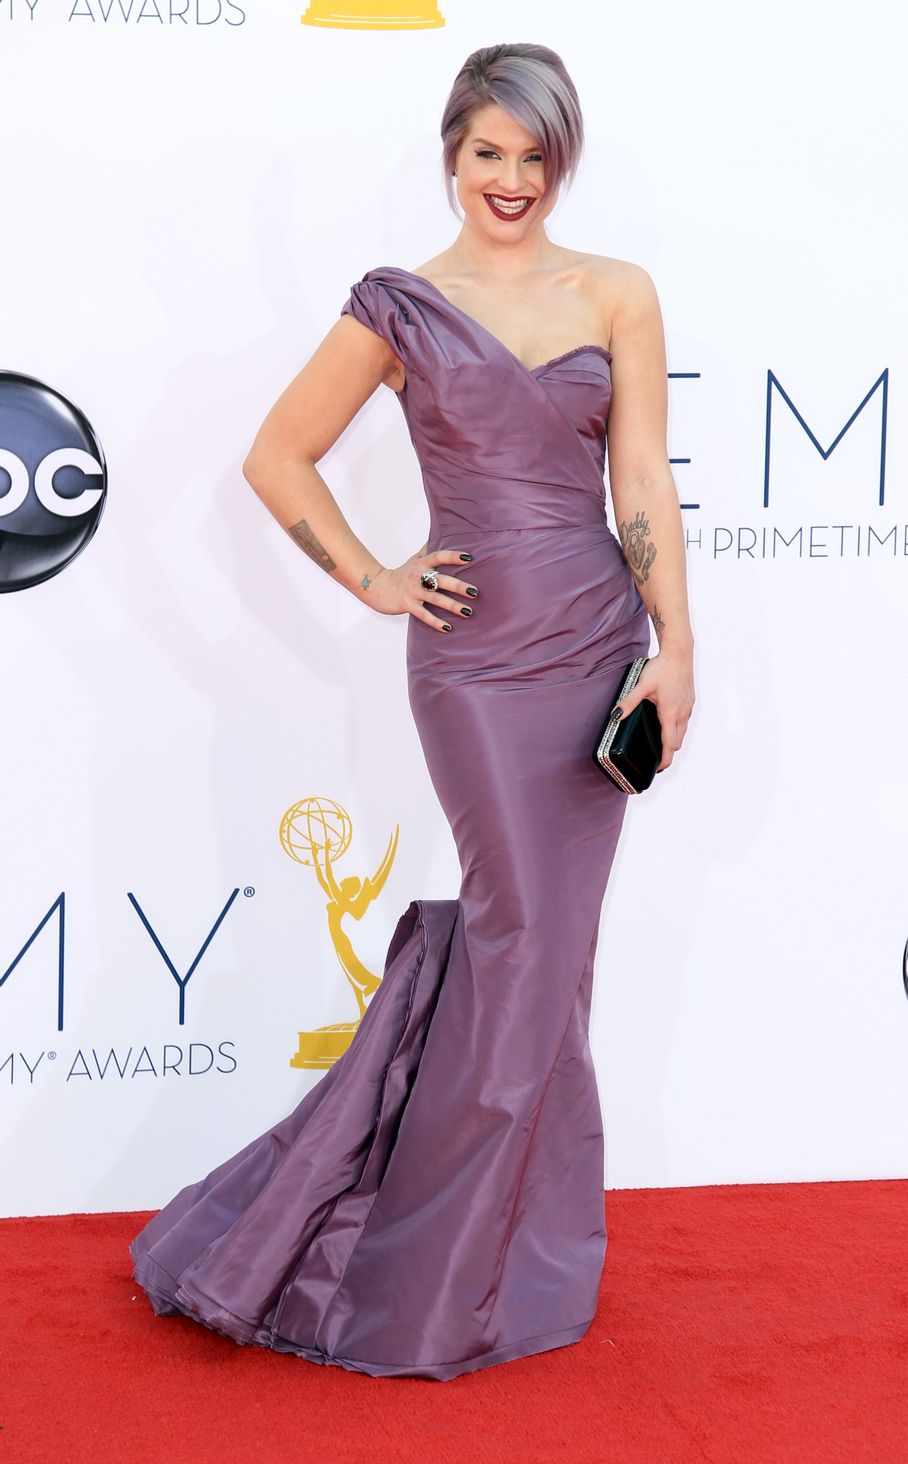 Kelly Osbourne - 2012 Emmy Awards, Red Carpet Looks